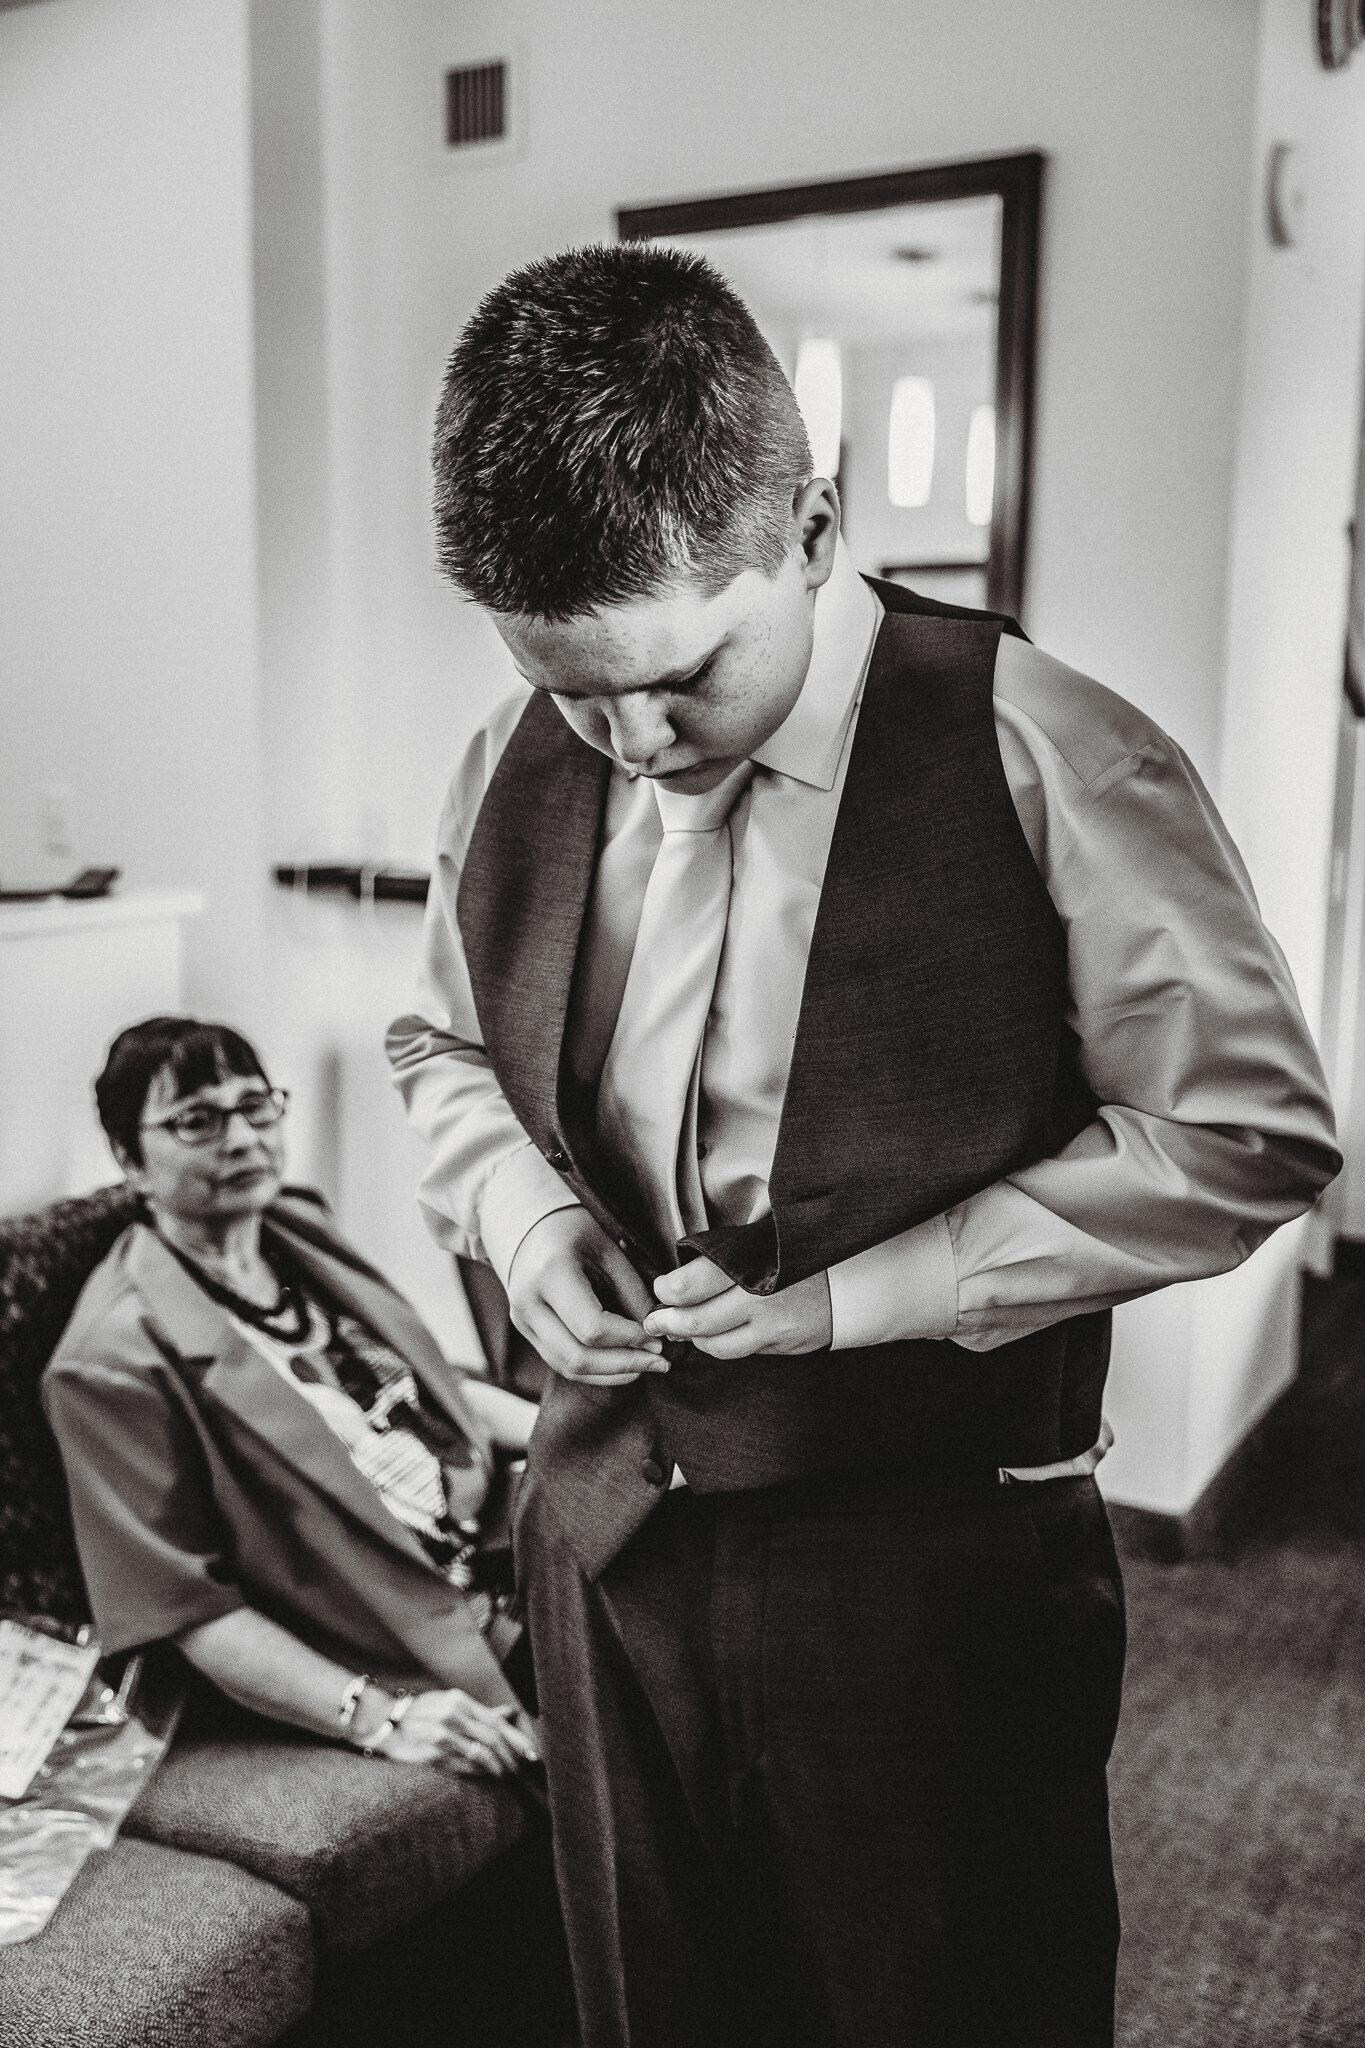 Shannon Lee Wedding Photography Long Island | Son Getting Ready